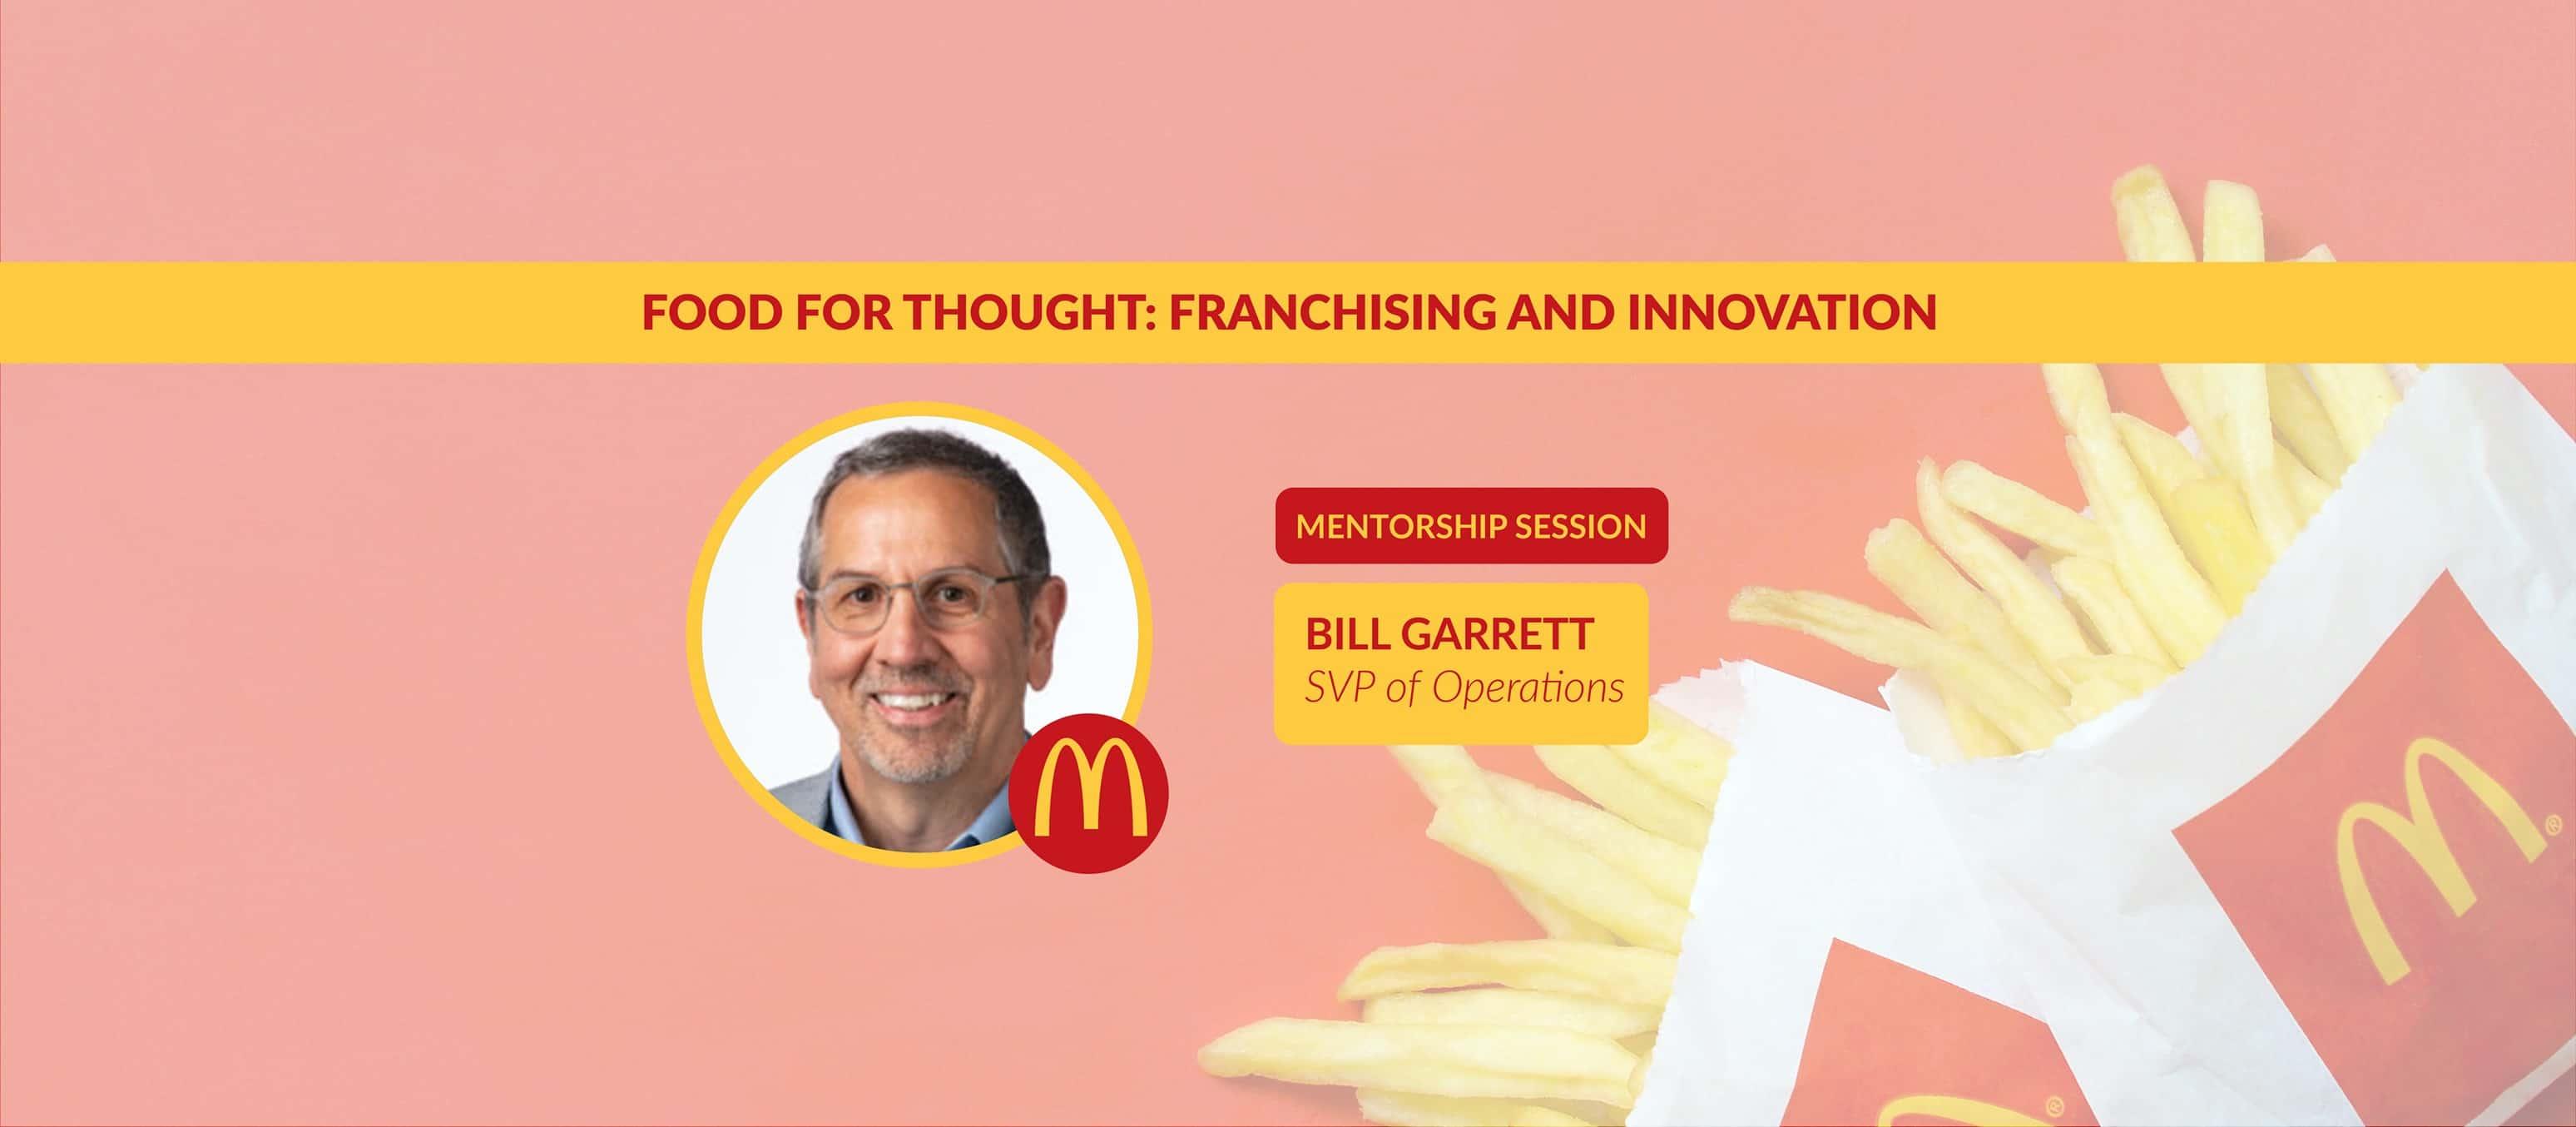 Food for Thought: Leadership & Innovation Mentorship with Bill Garrett, SVP of Operations at McDonal